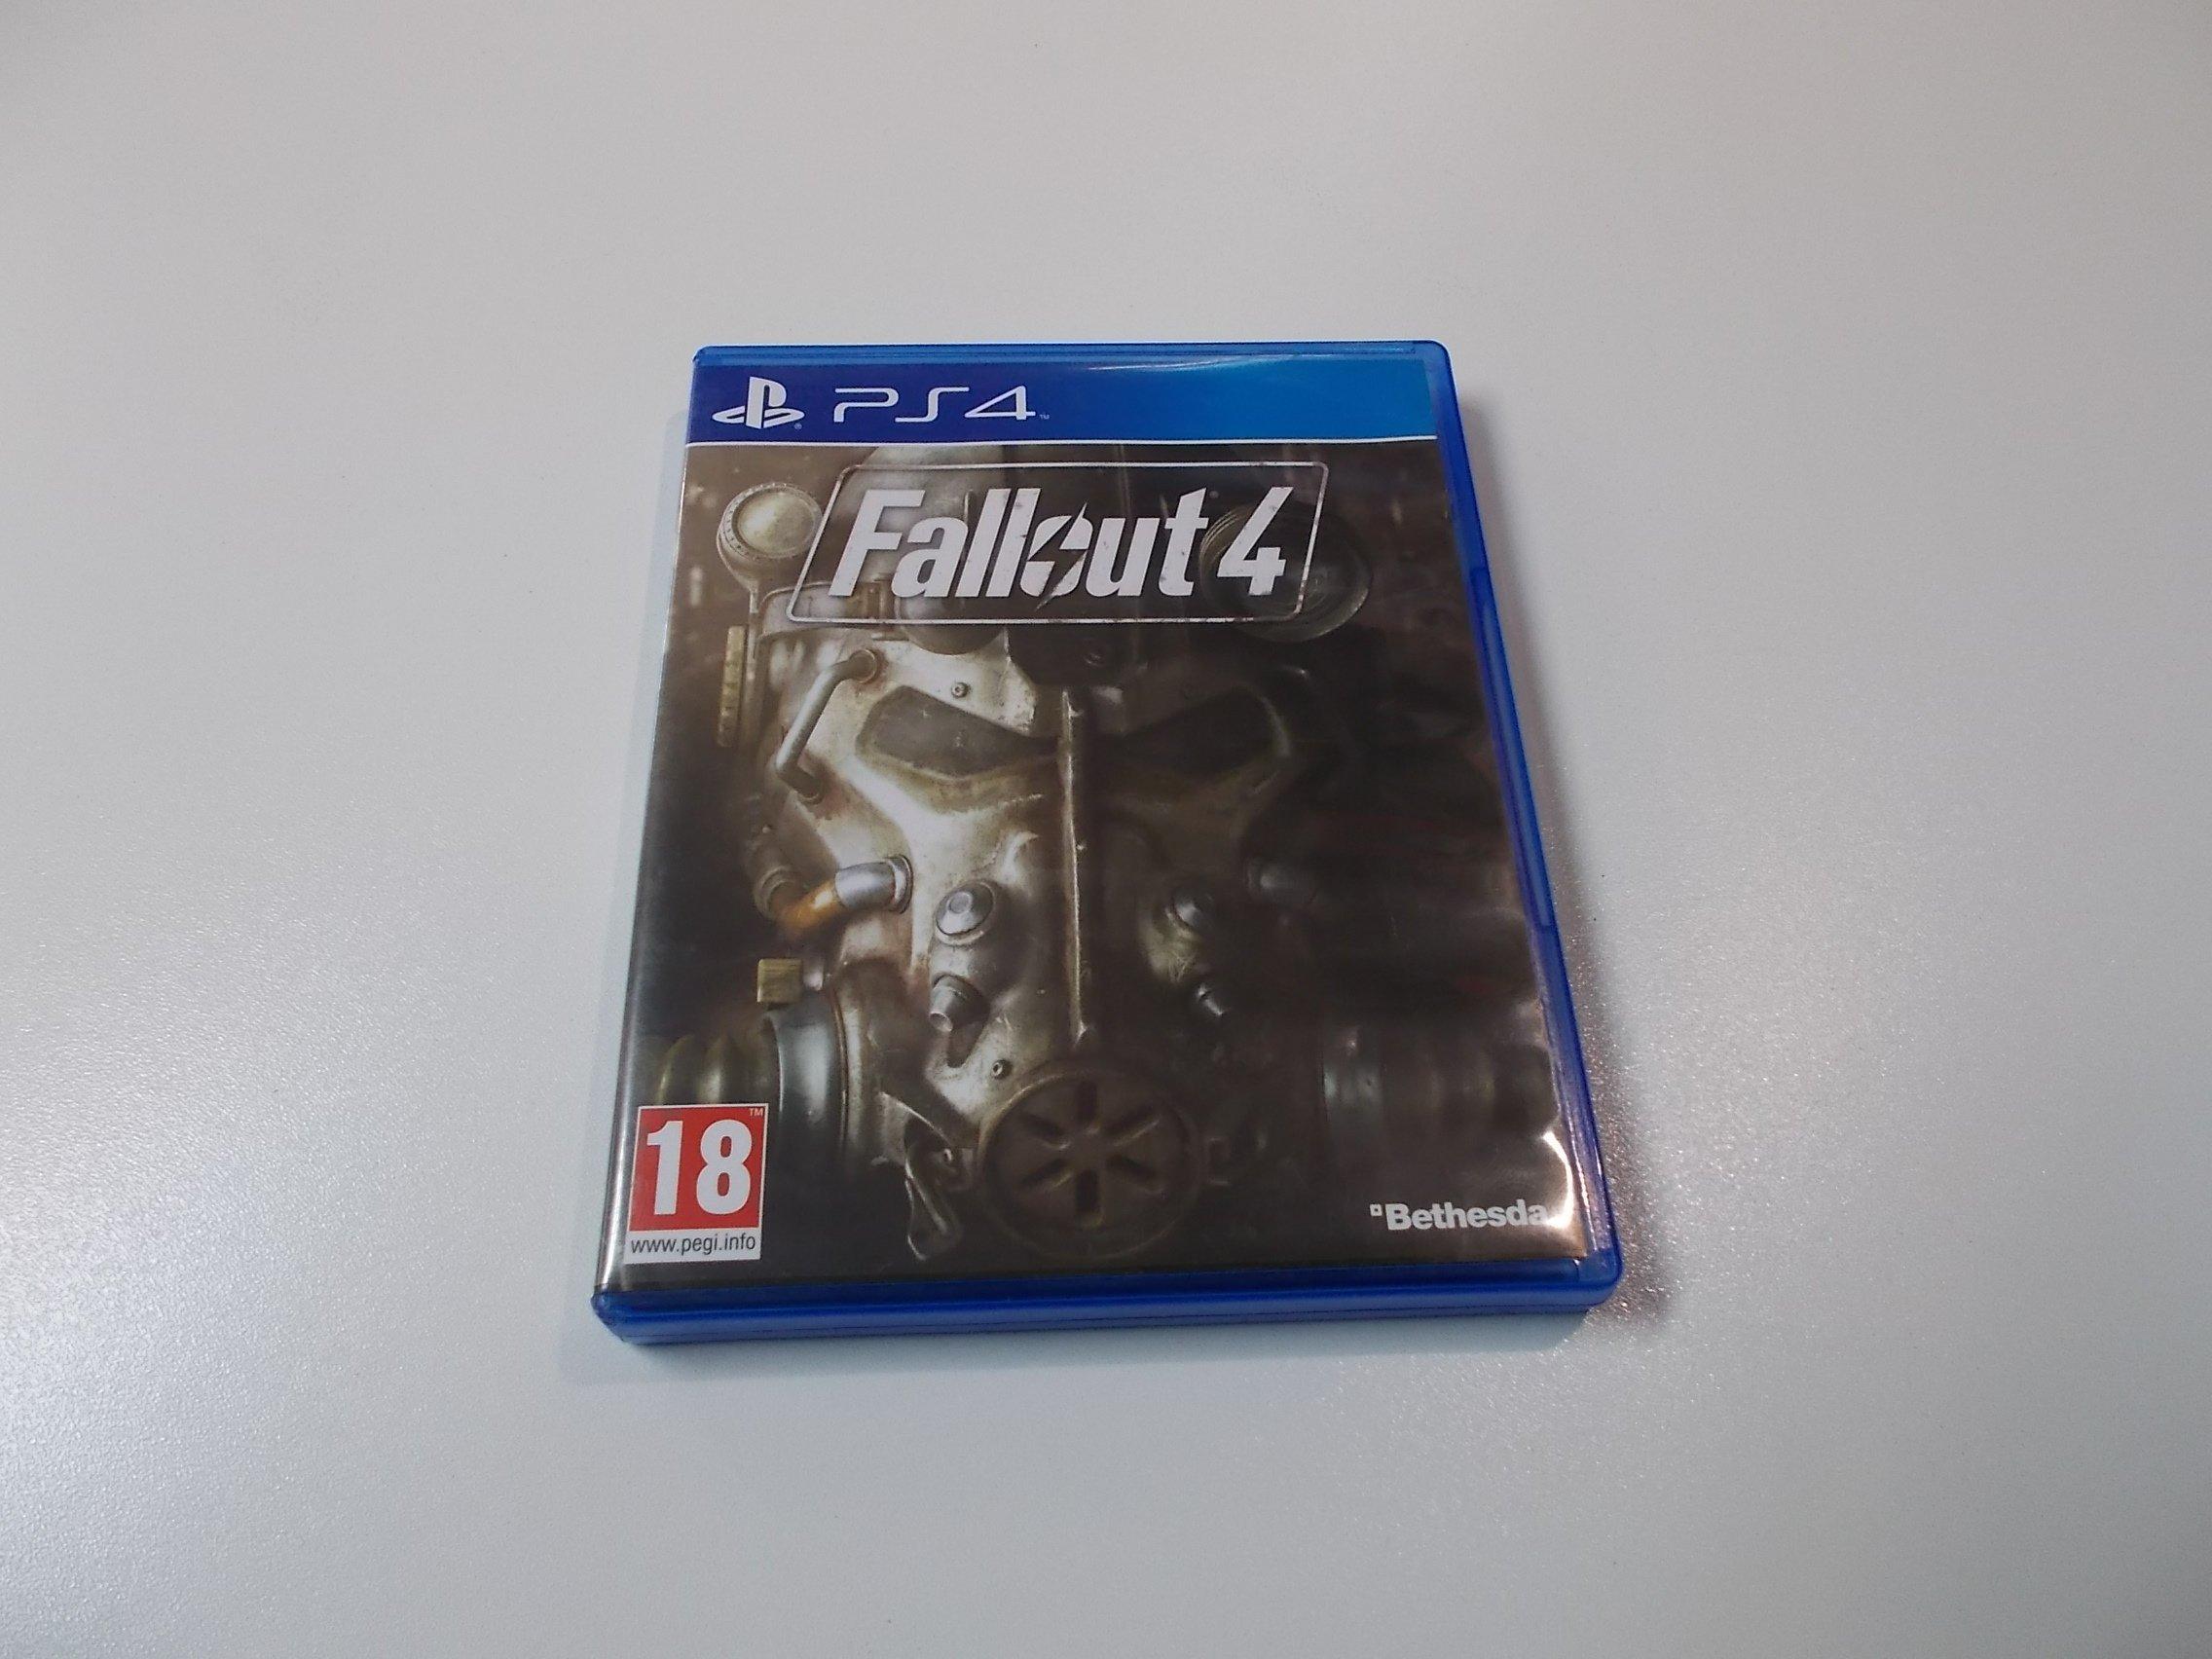 Fallout 4 - GRA Ps4 - Opole 0426